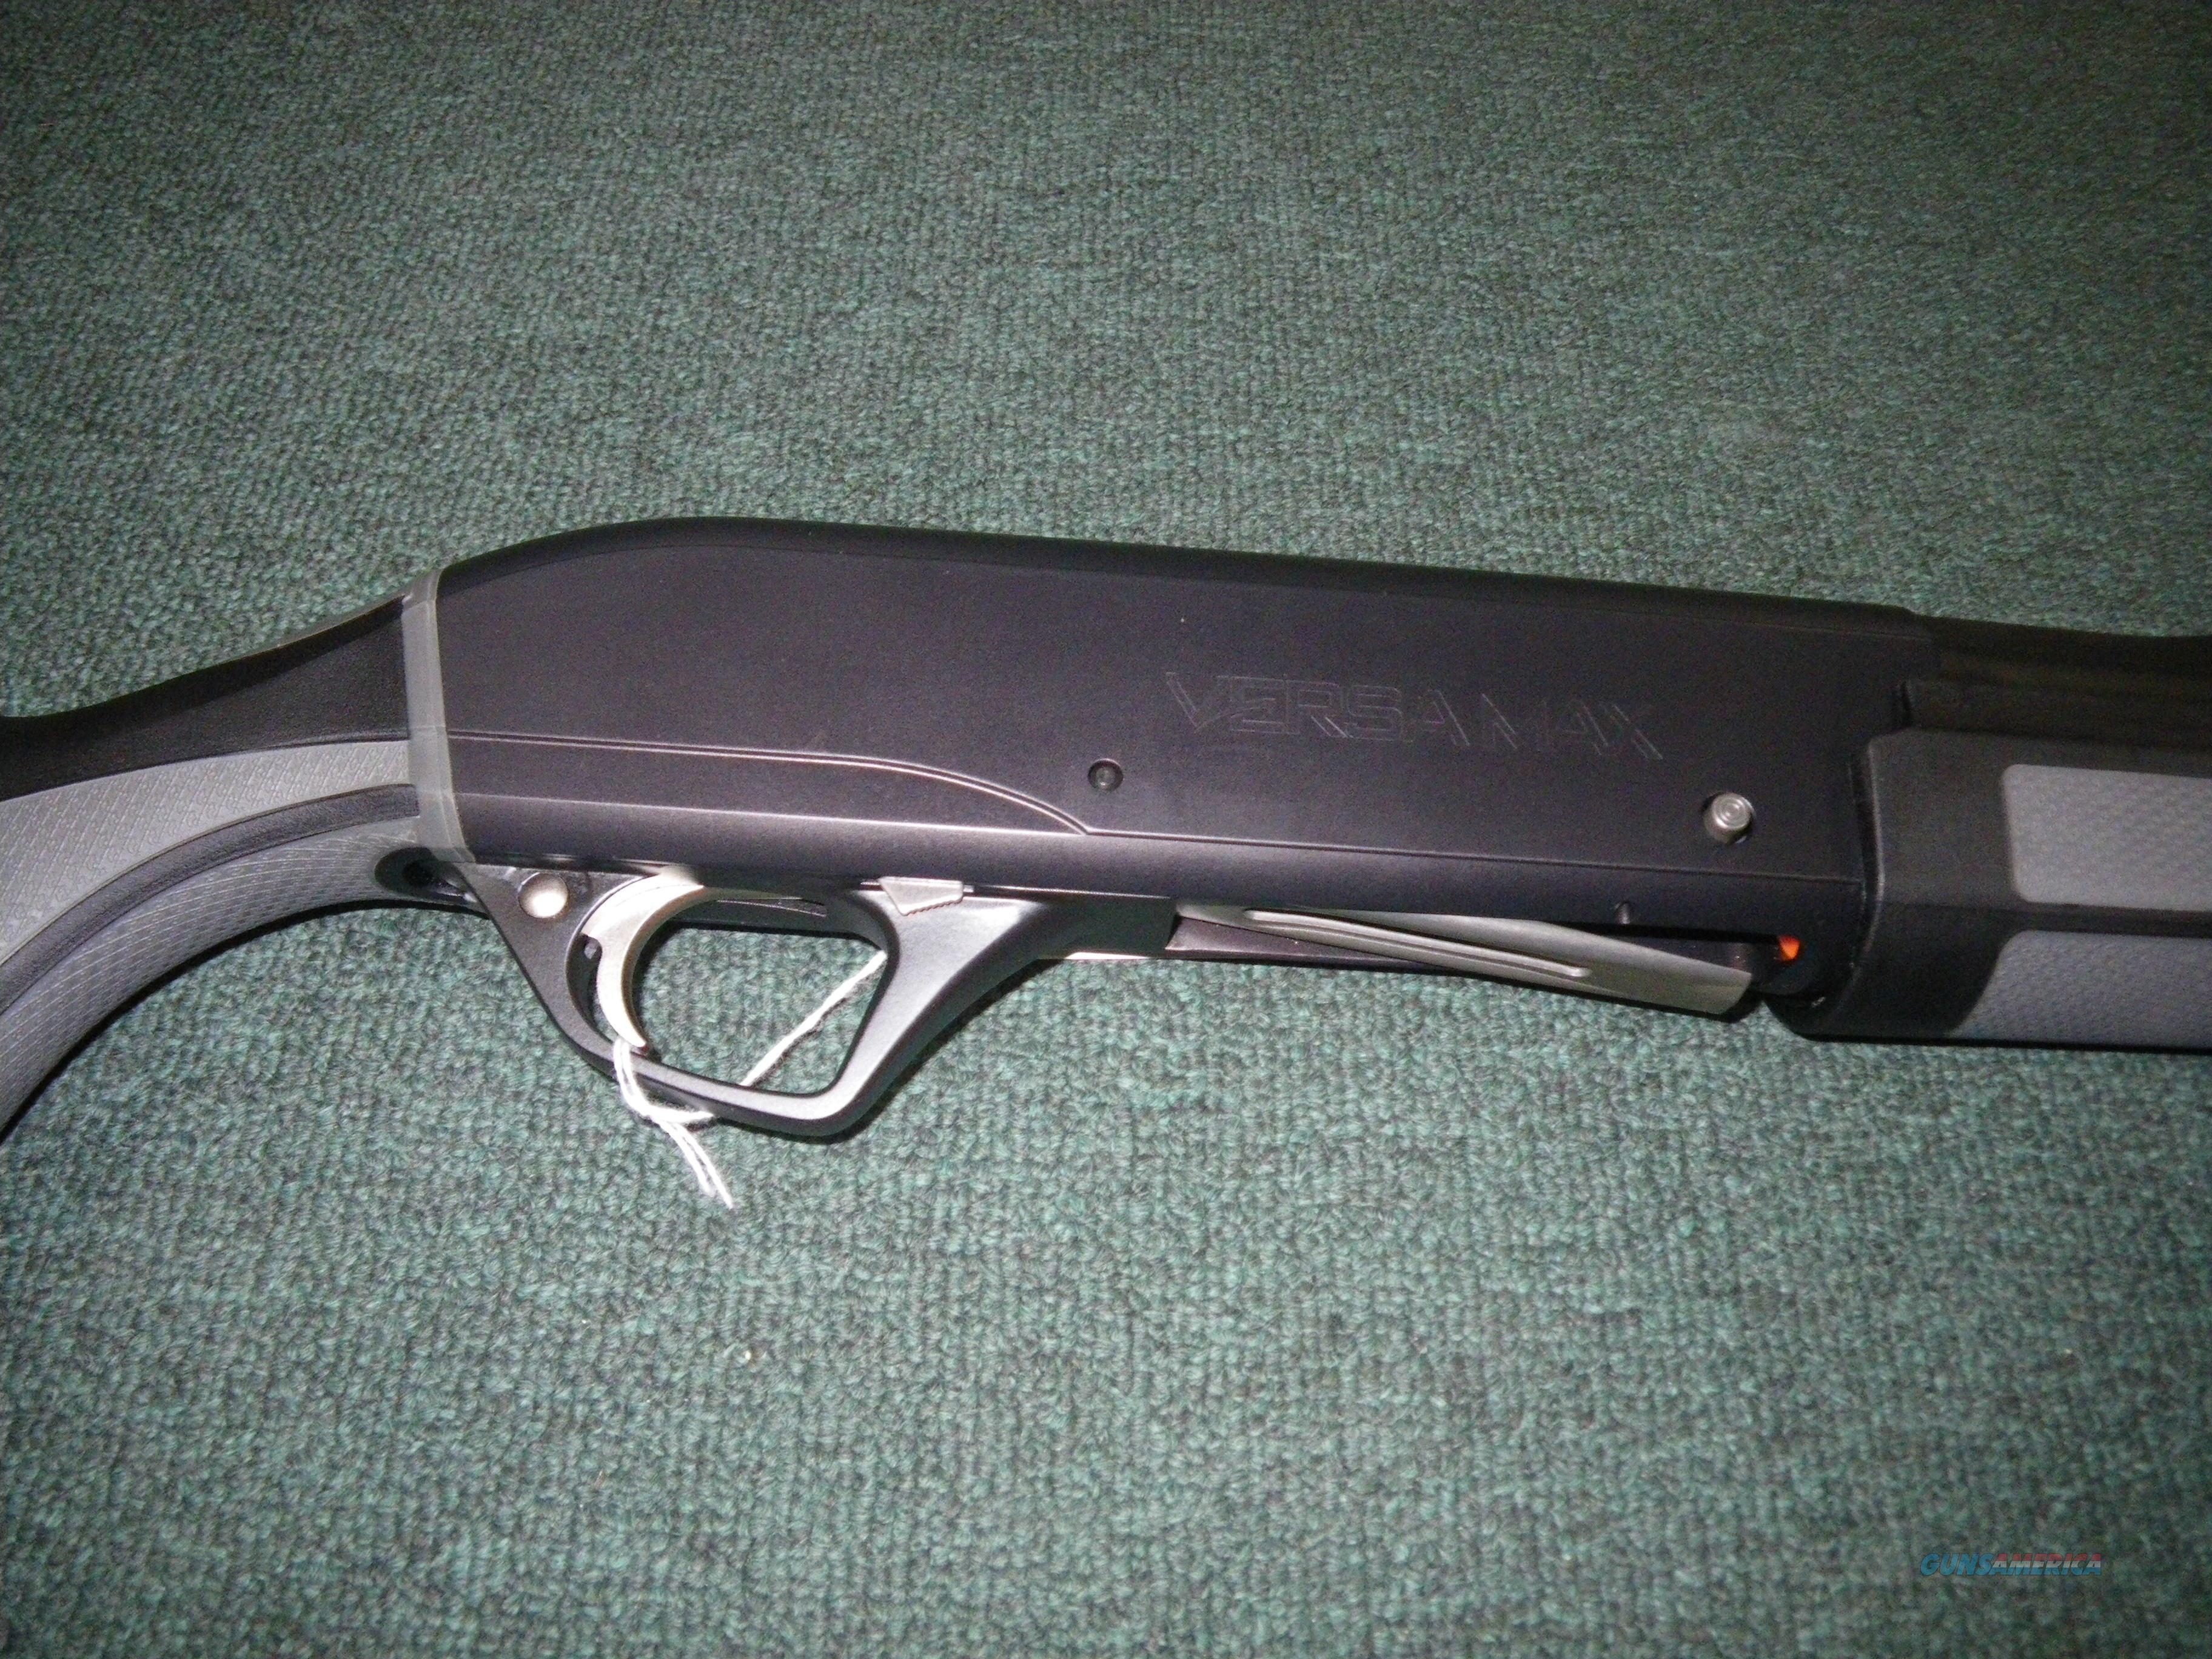 Remington Versa Max Synthetic LH Auto 12ga 28